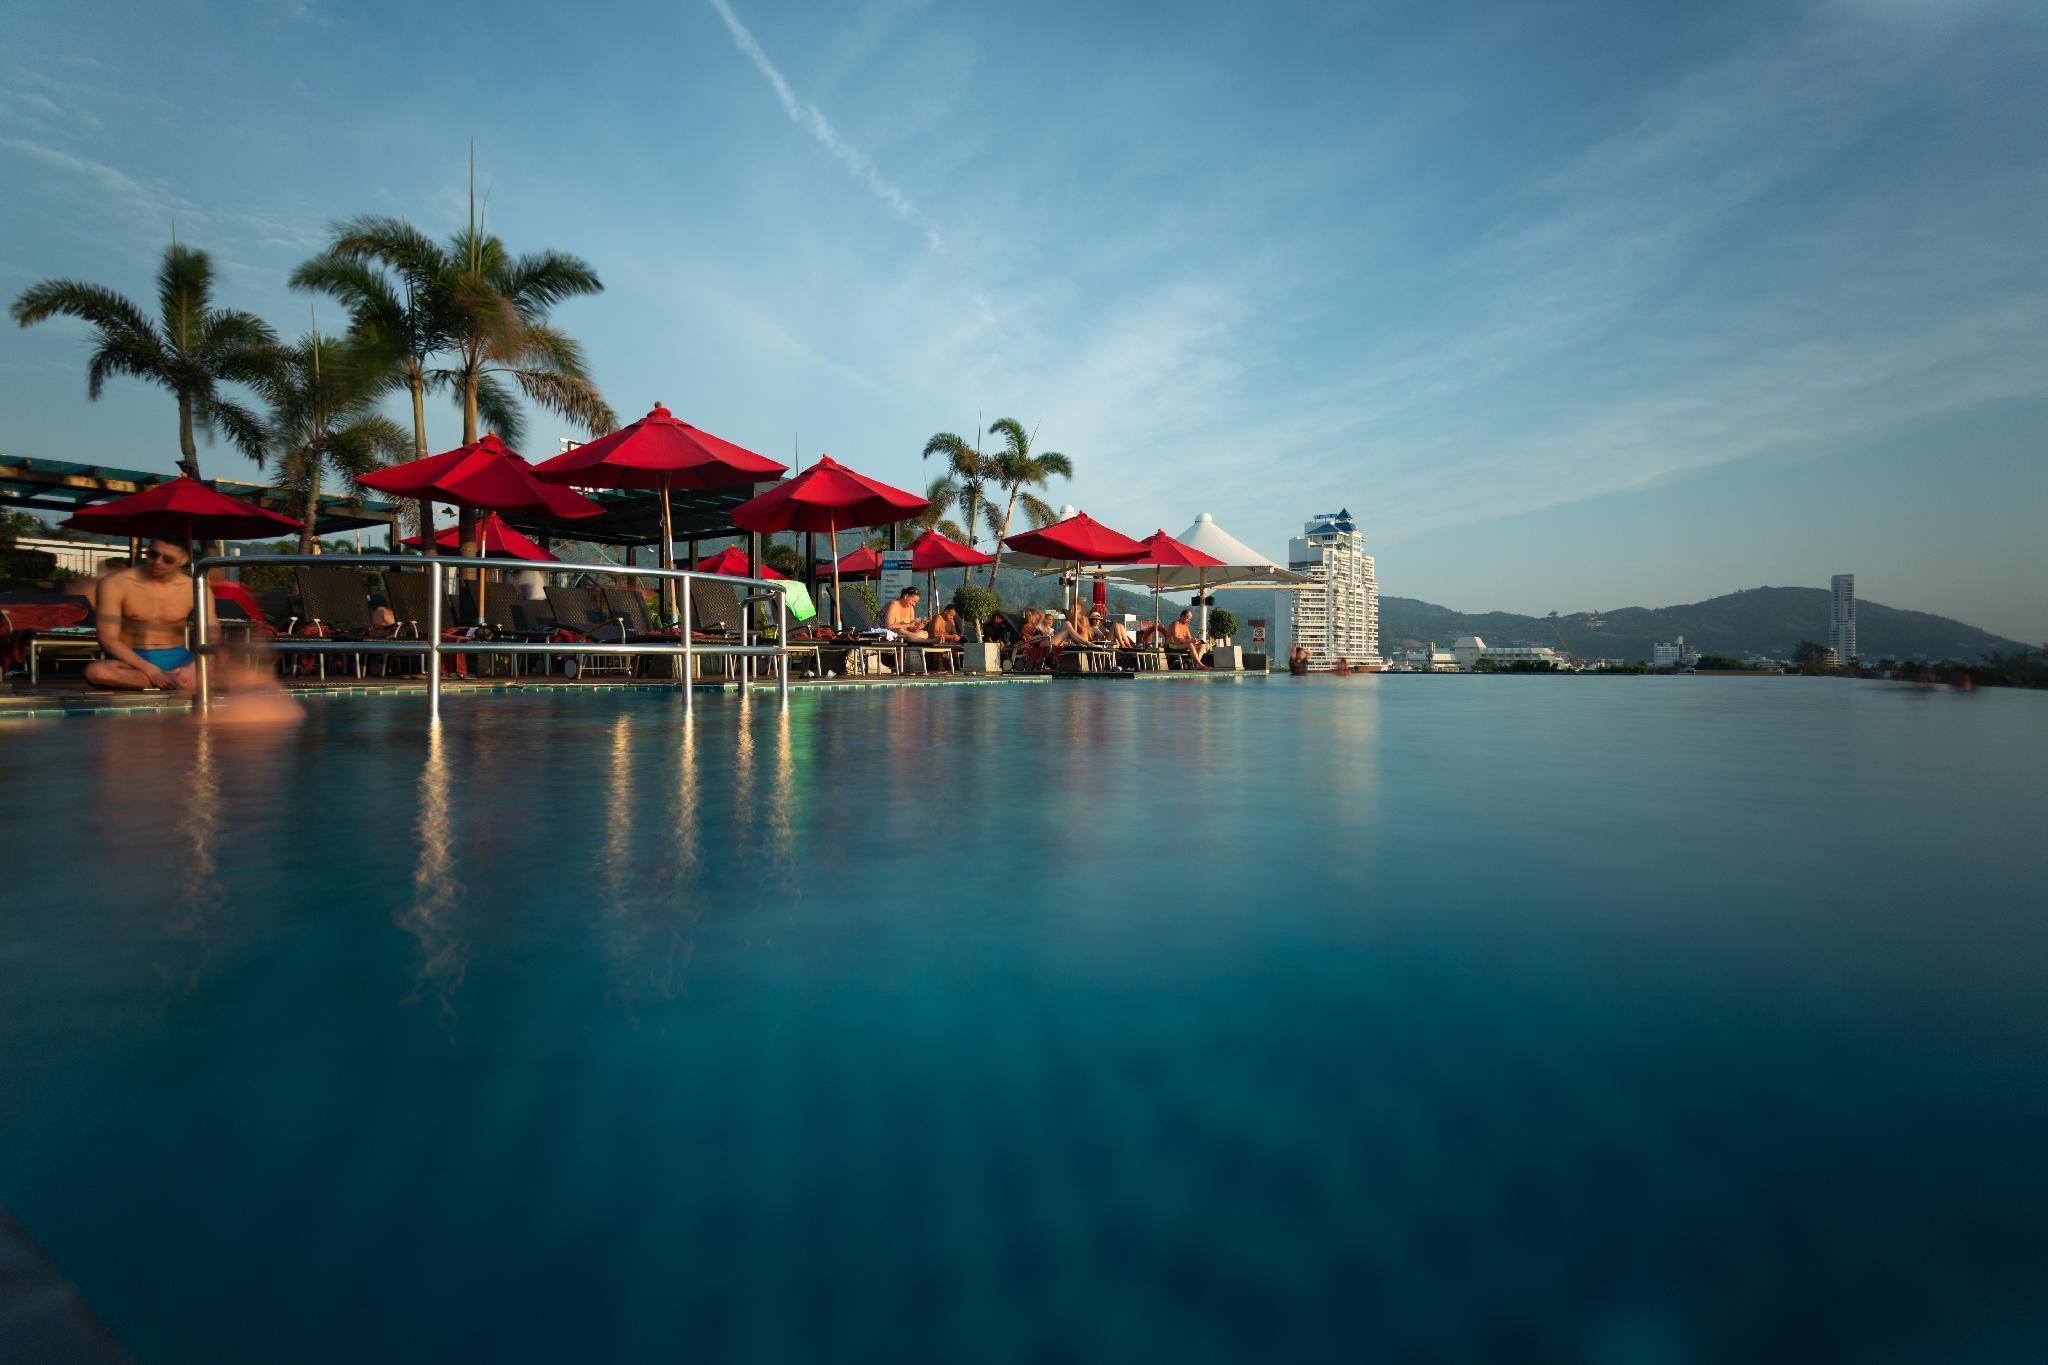 The Charm Resort Phuket เดอะ ชาร์ม รีสอร์ท ภูเก็ต